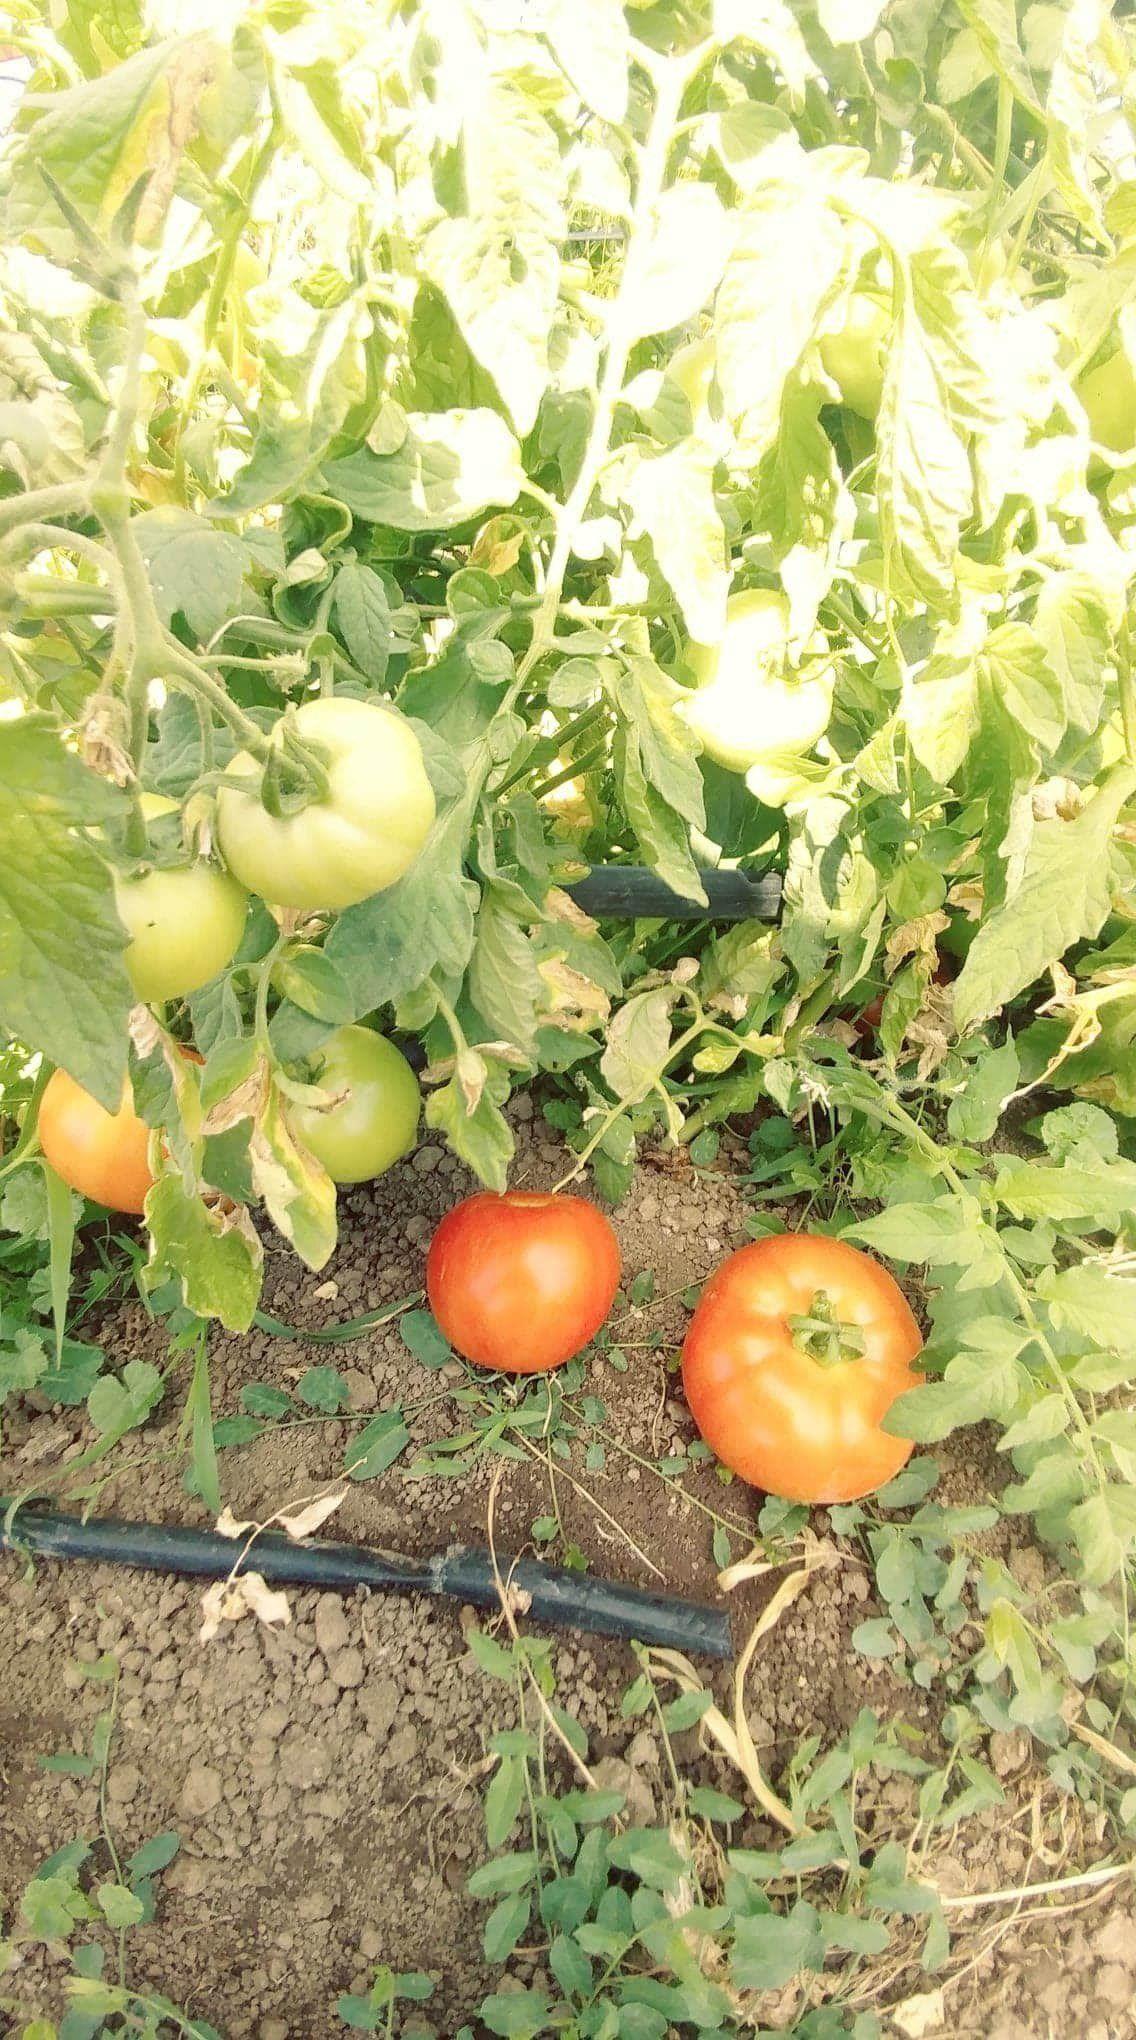 Next Happening: Tomatoes!